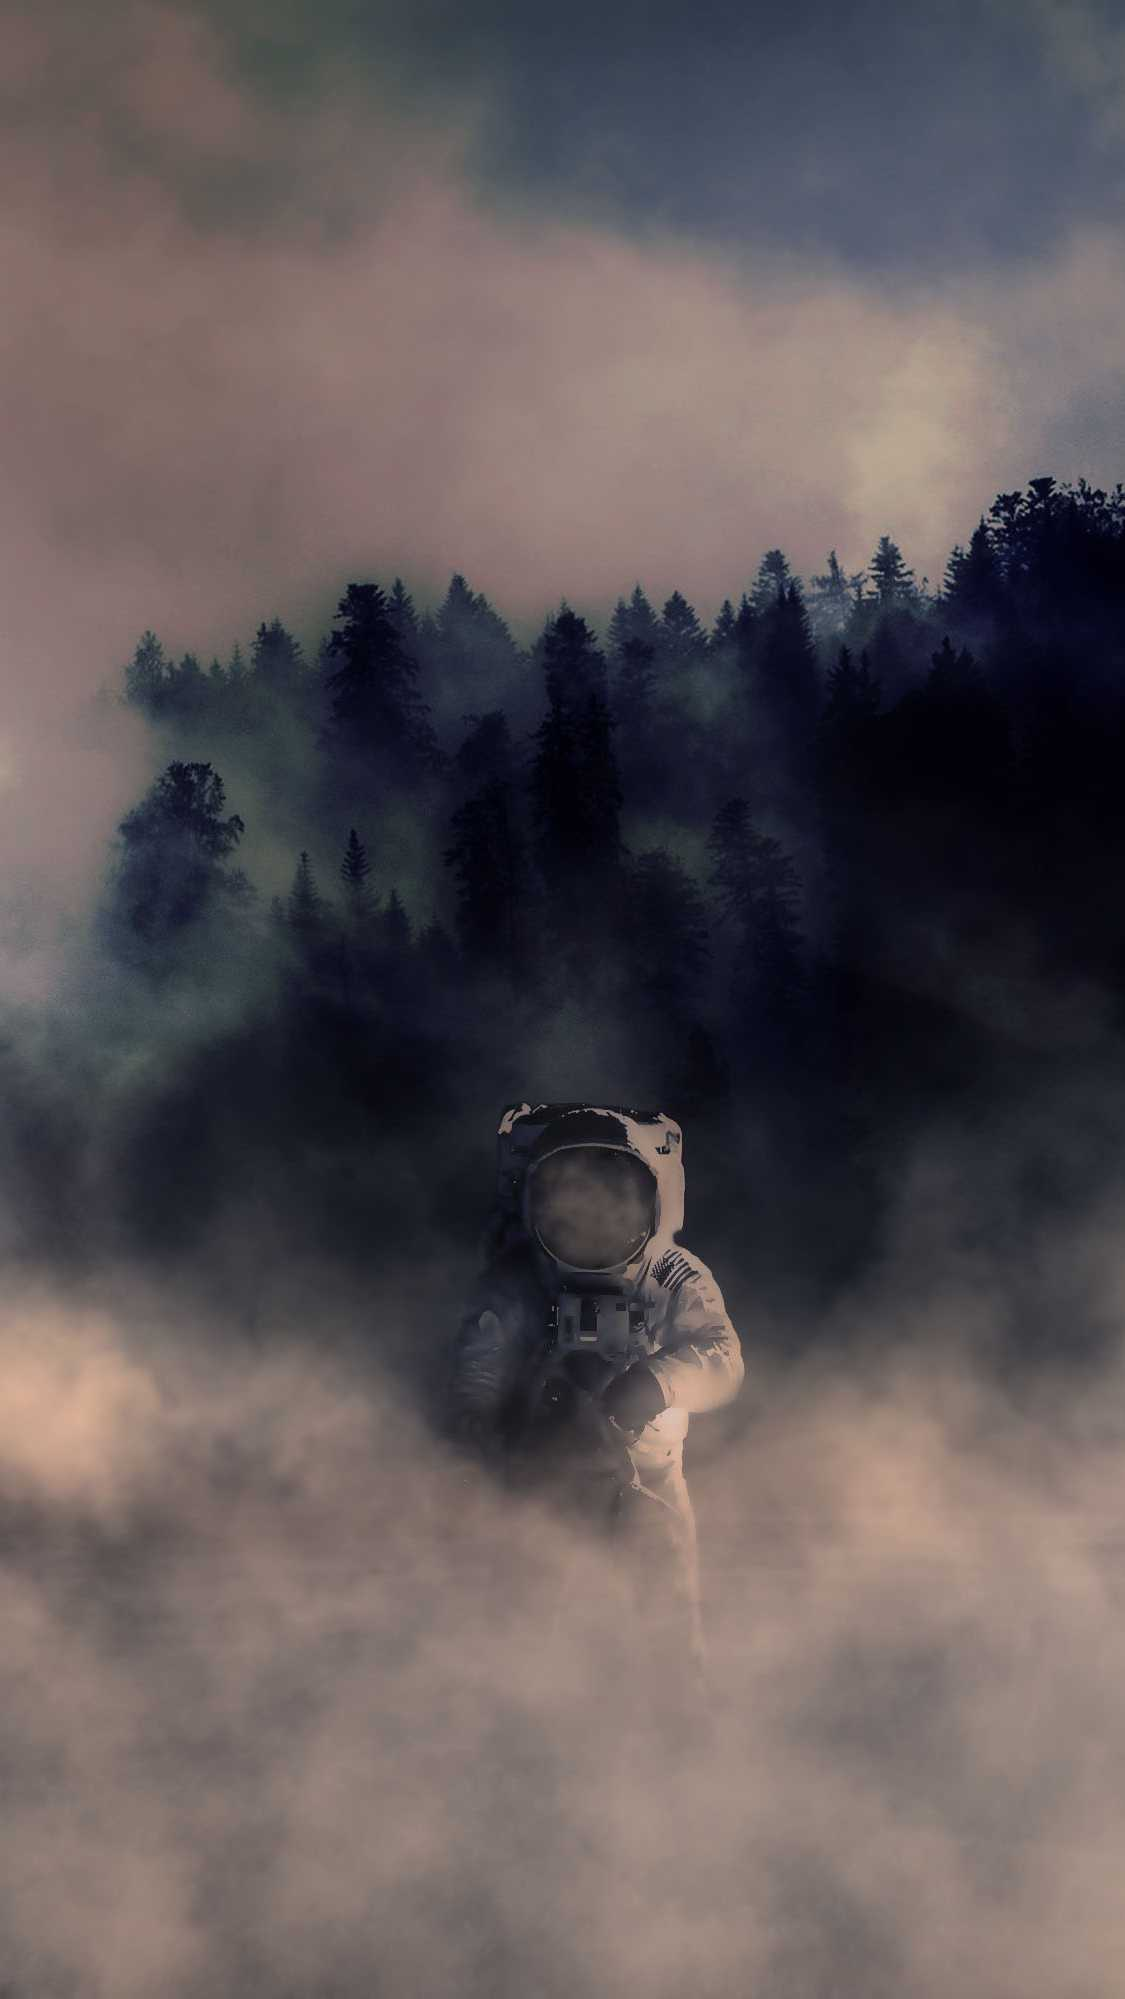 Forest Astronaut iPhone Wallpaper